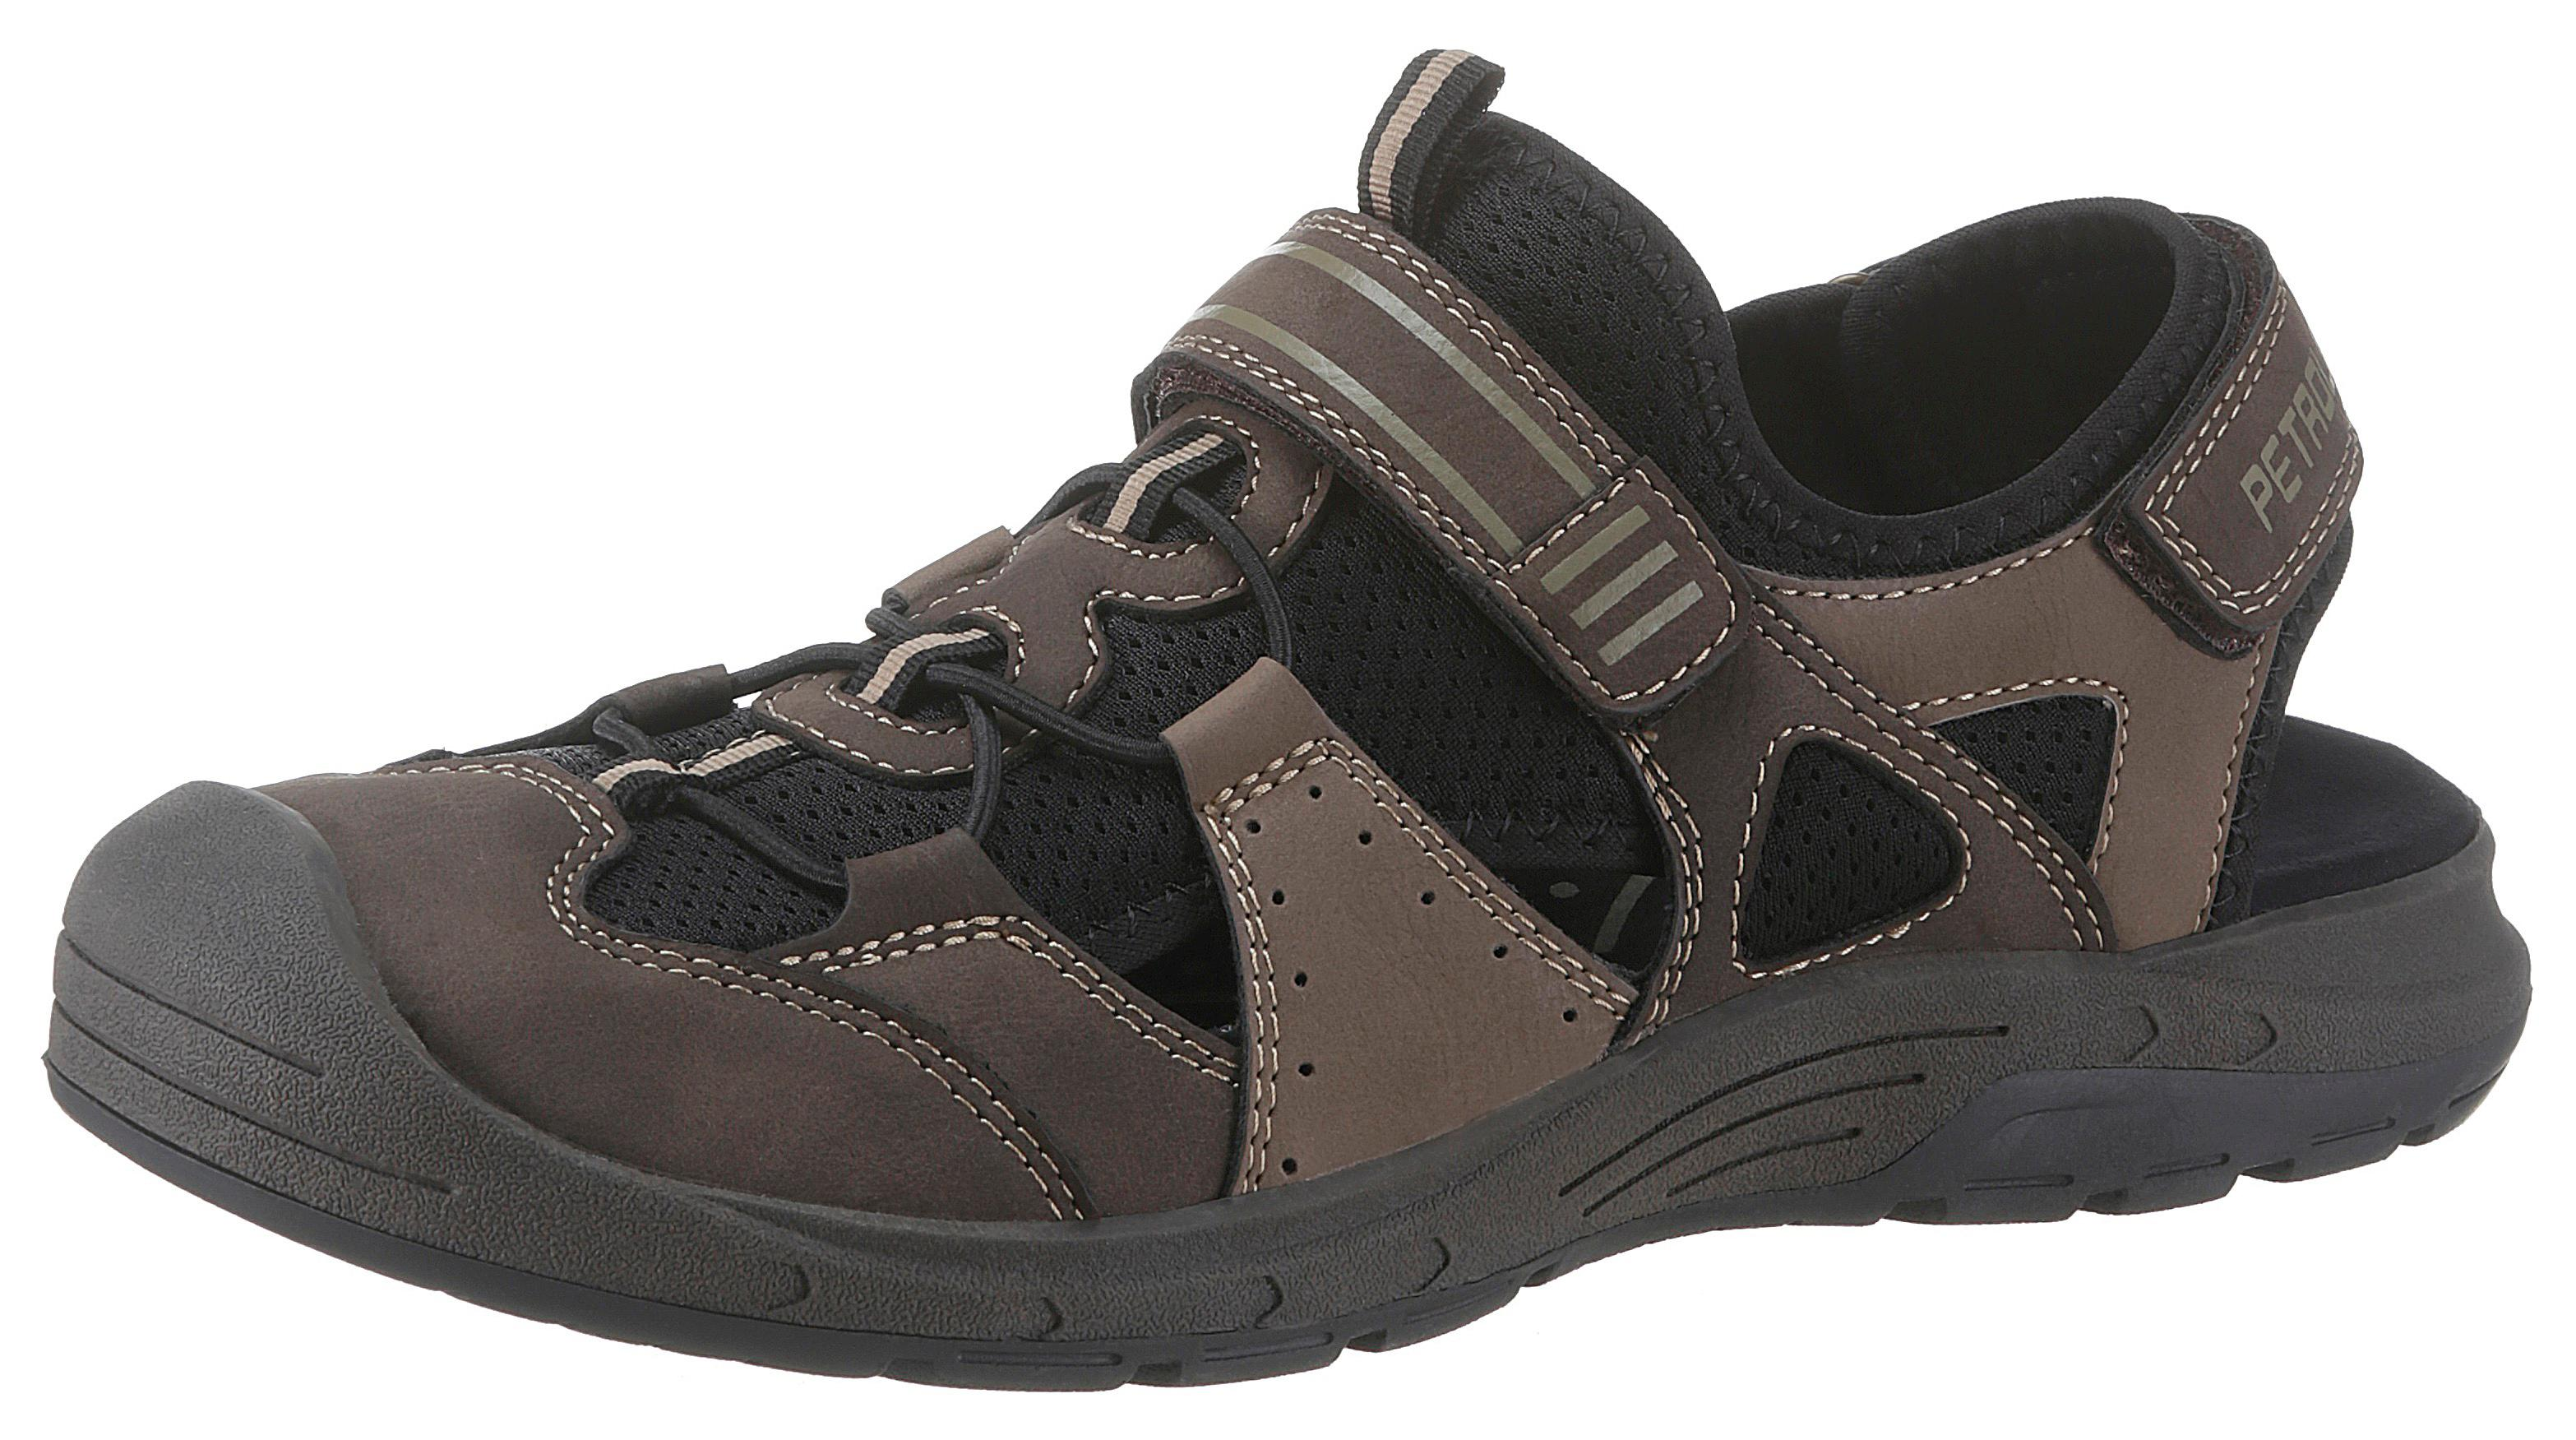 PETROLIO Sandale   Schuhe > Sandalen & Zehentrenner > Sandalen   Petrolio